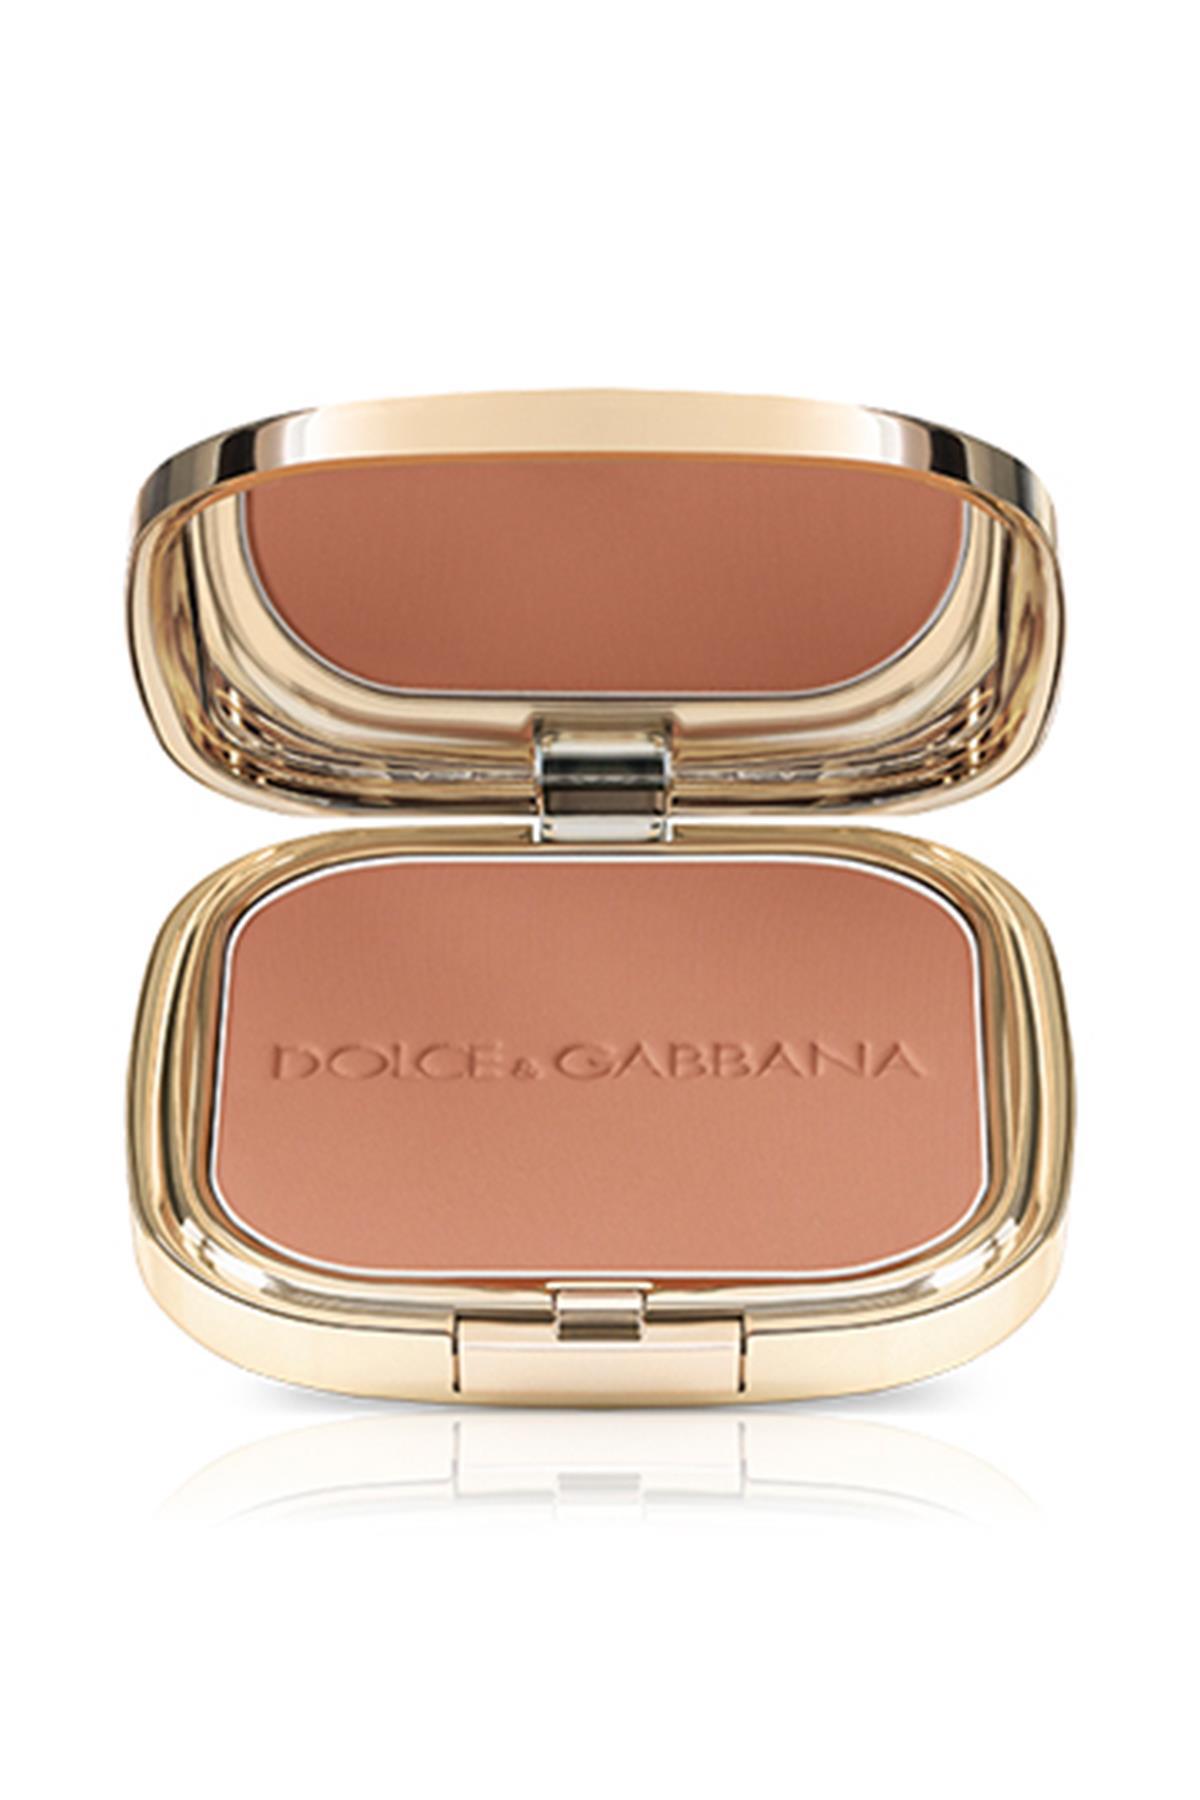 Dolce Gabbana Glow Bronzing Powder 30 Sunshine Pudra